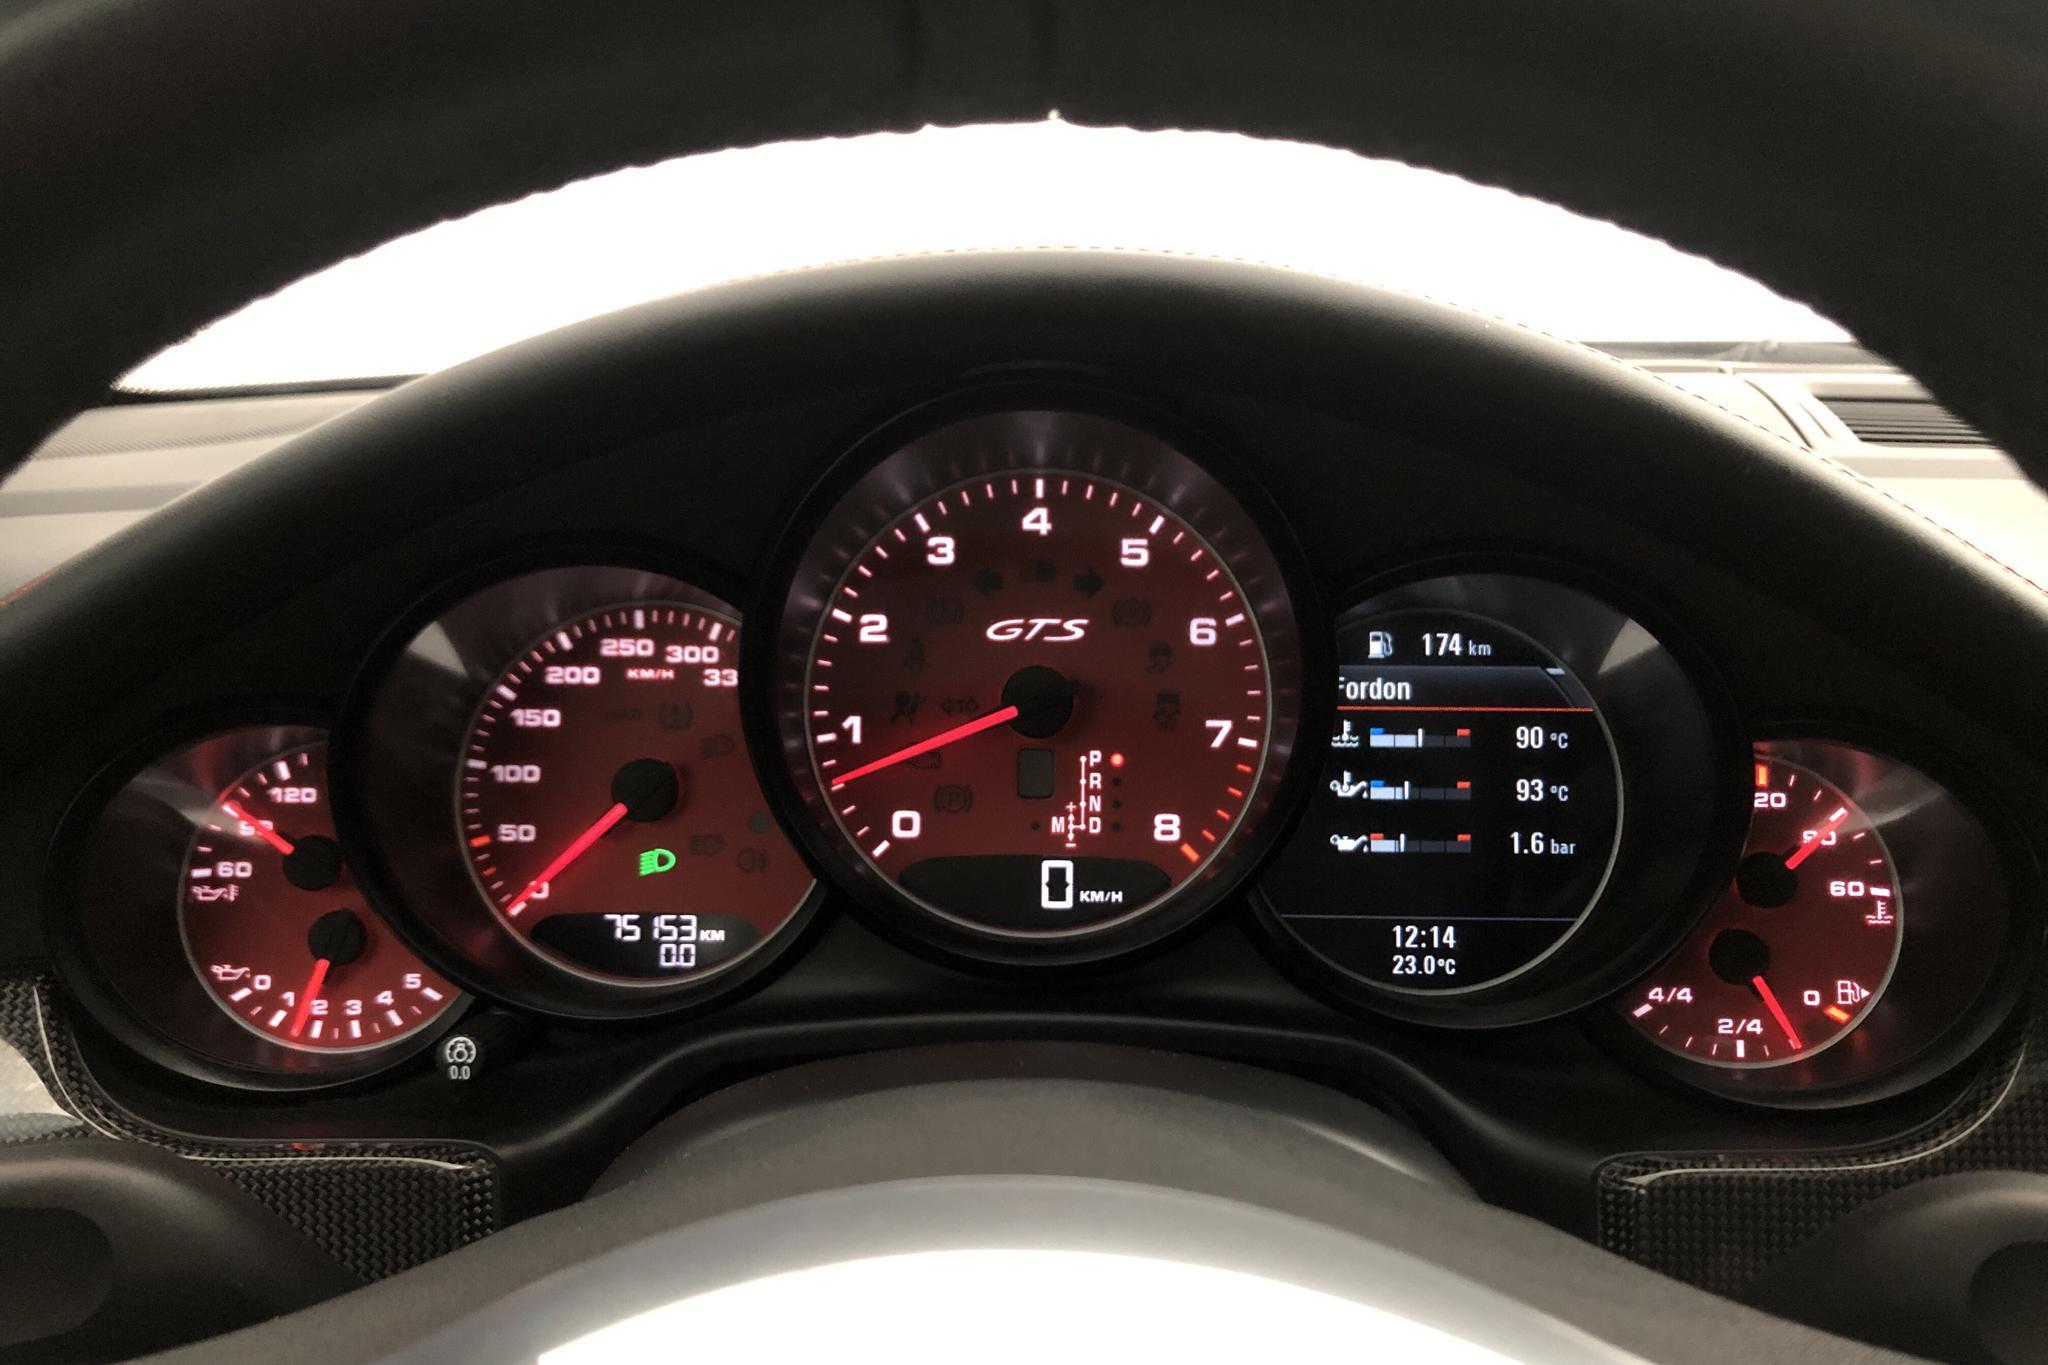 Porsche Panamera GTS (440hk) - 75 150 km - Automatic - silver - 2014